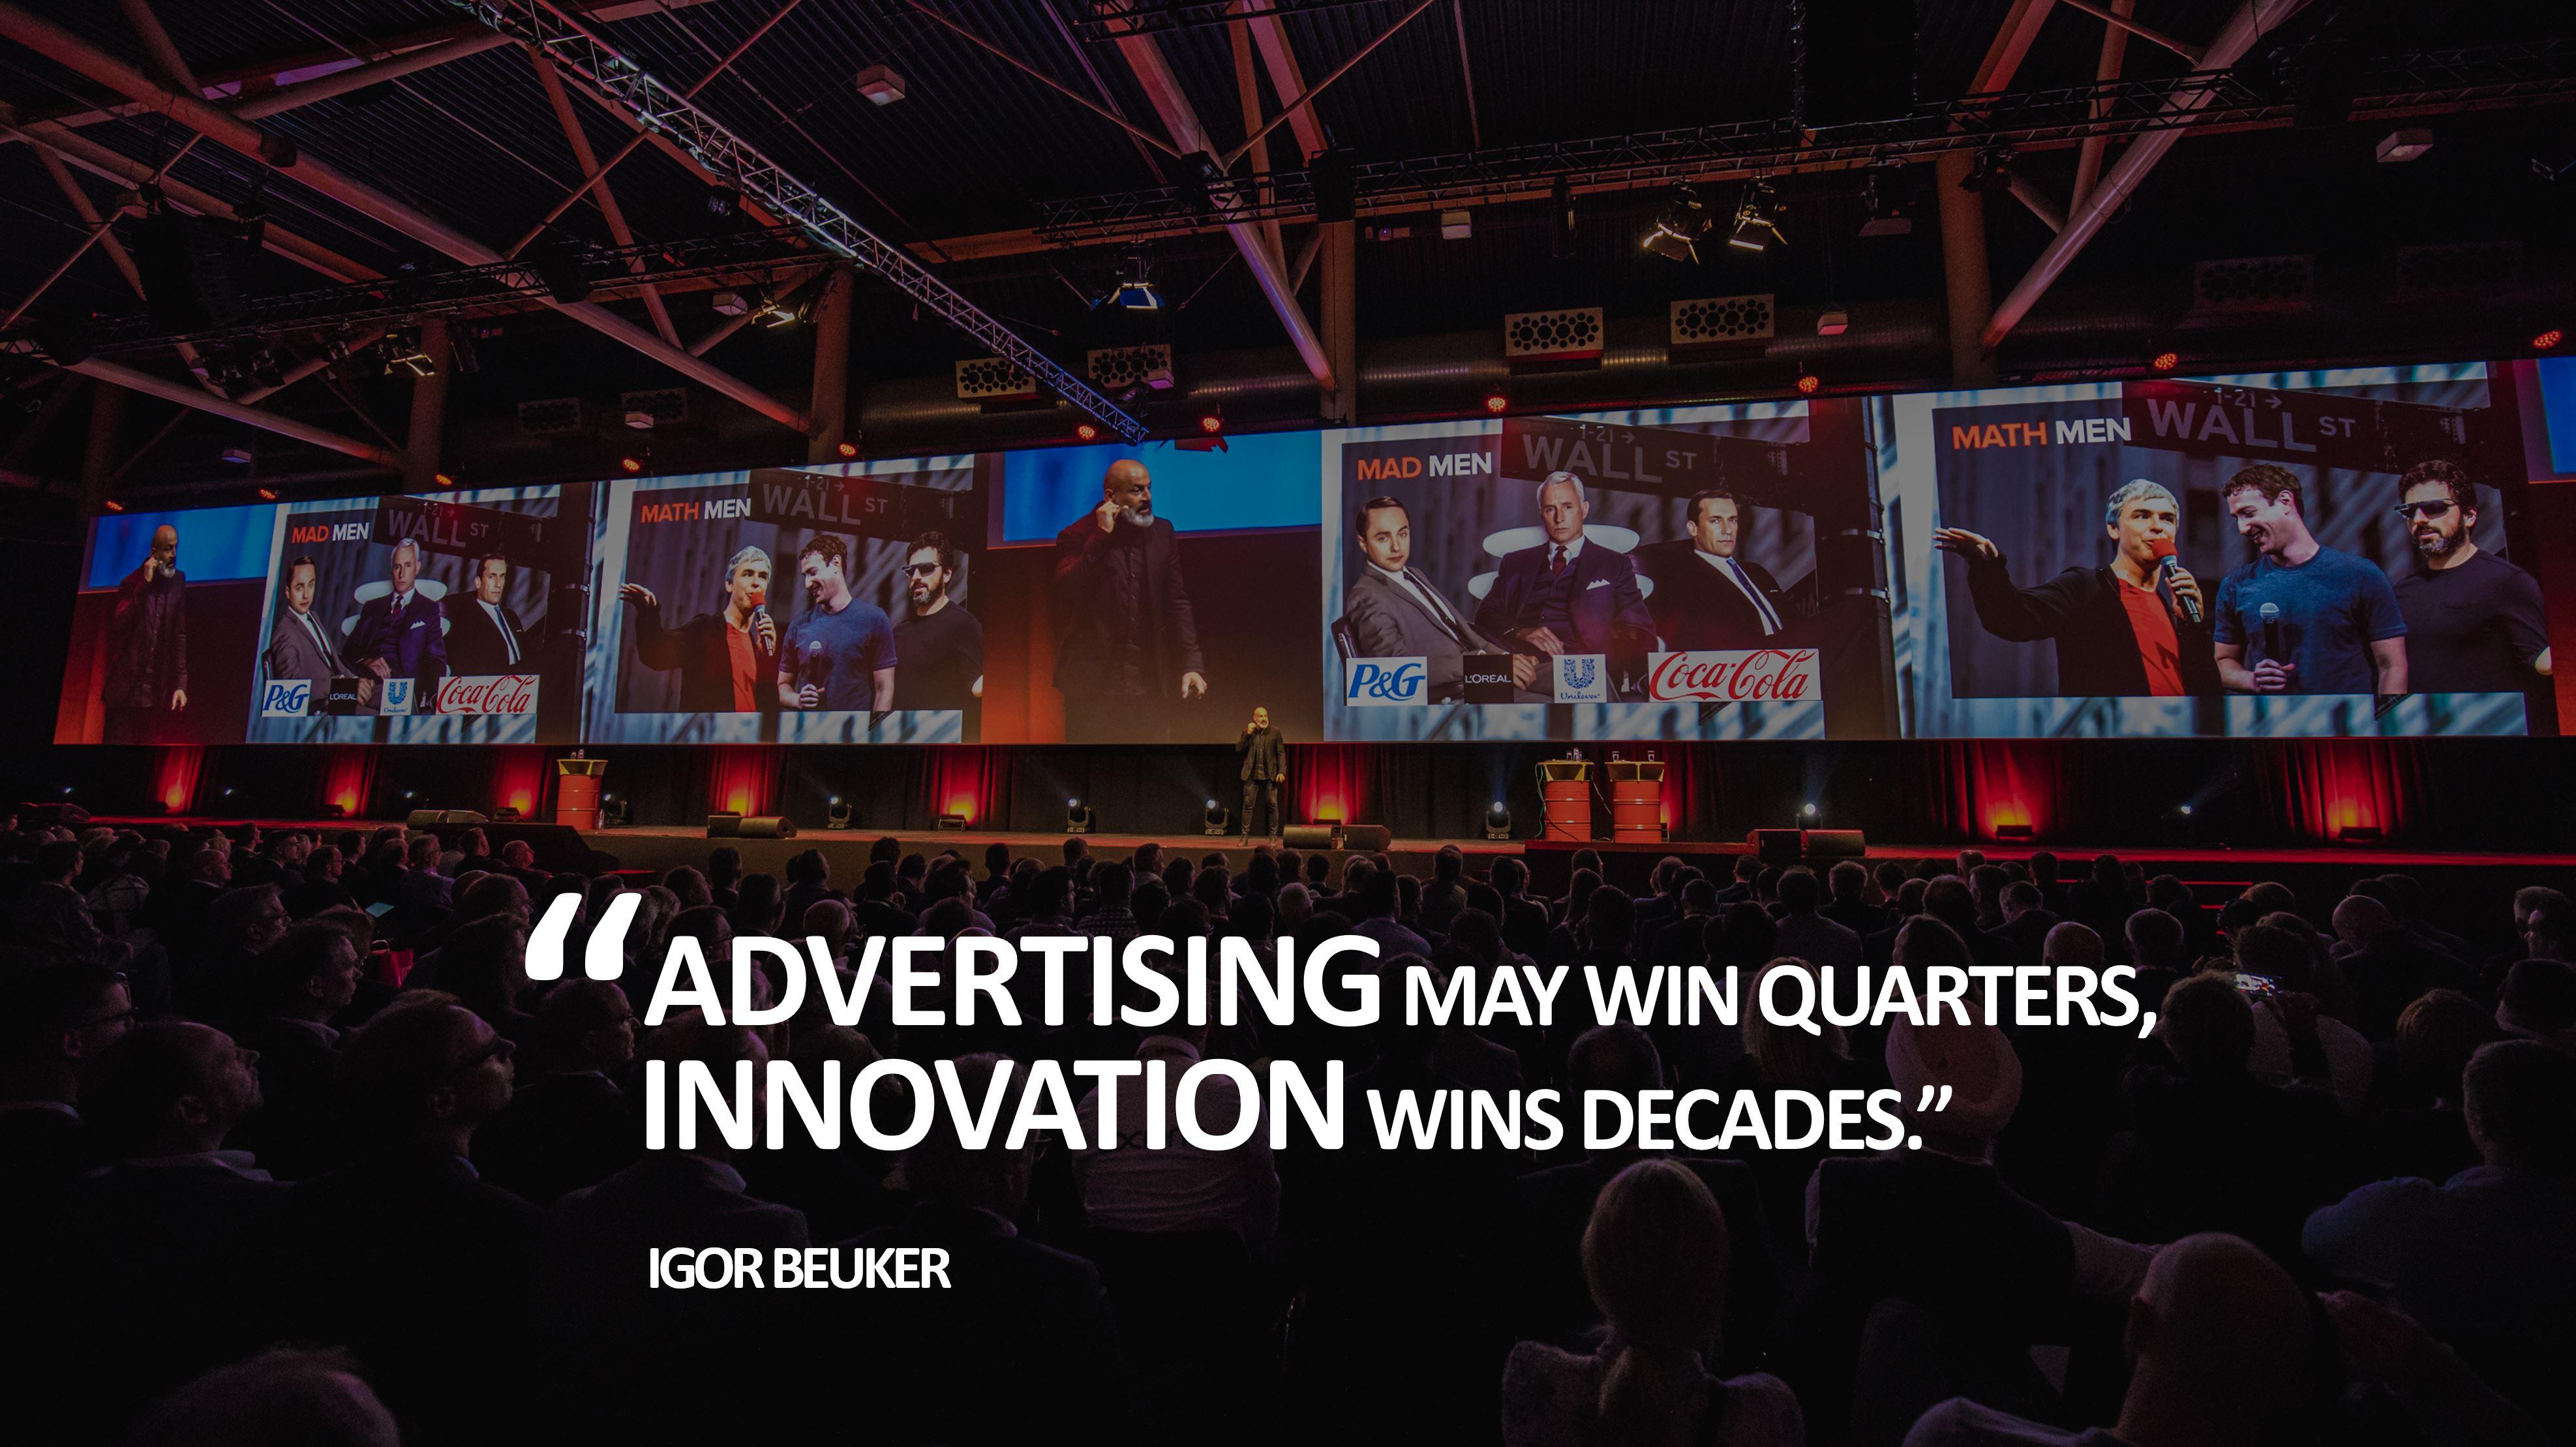 iab_keynote_speaker_host_igor_beuker_advertising may win quarters, innovations wins decades